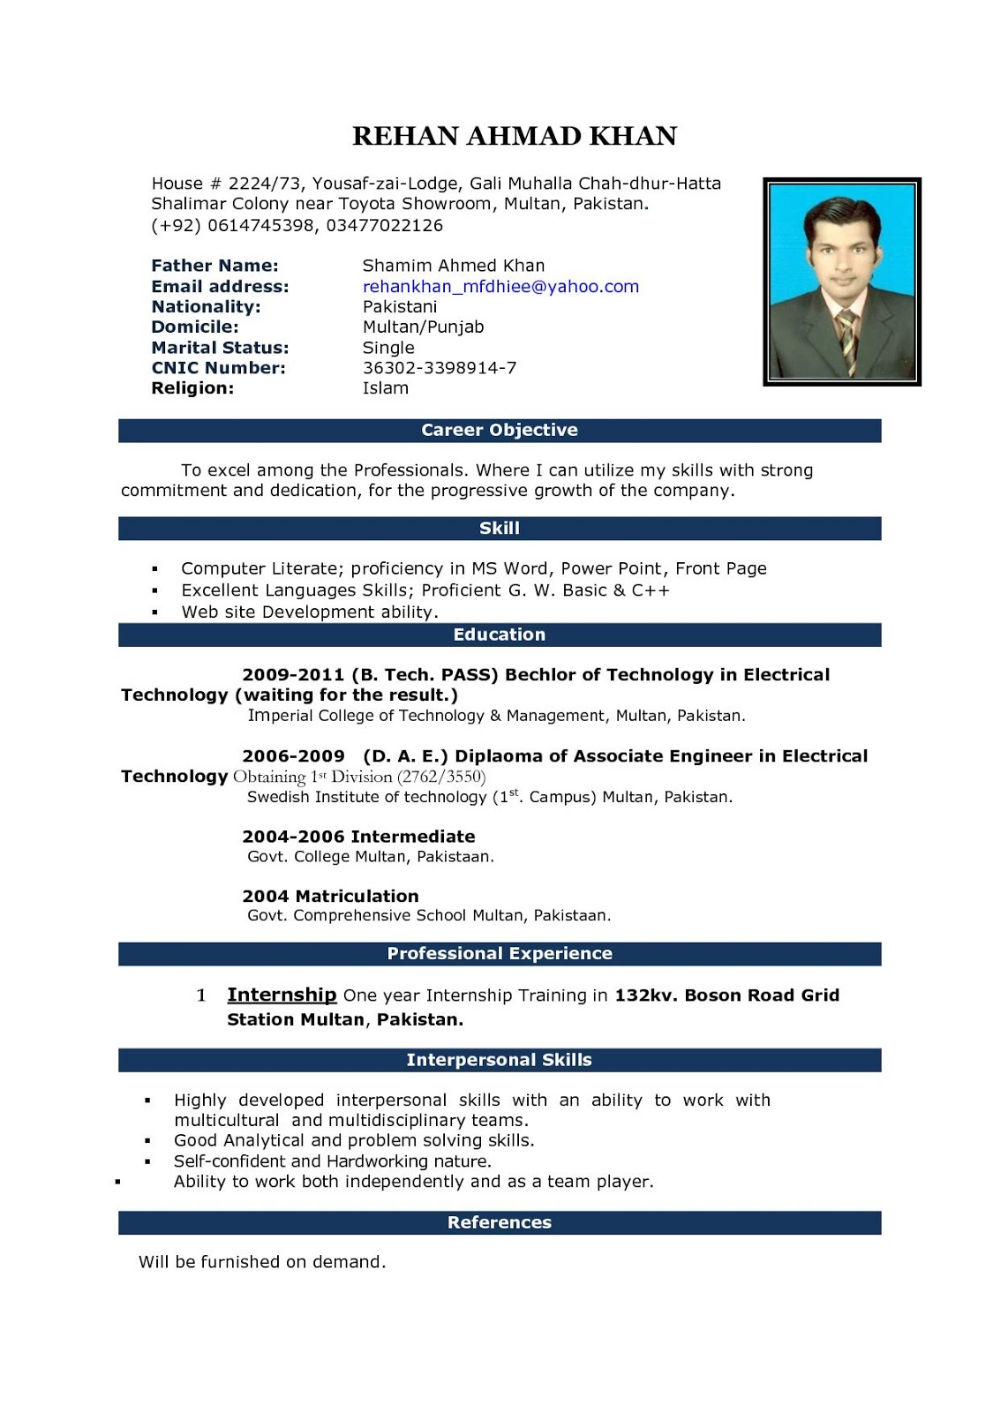 Free Resume Templates Free Resume Templates Word Free Resume Templates 2020 Free Res Microsoft Word Resume Template Resume Template Word Resume Format Download